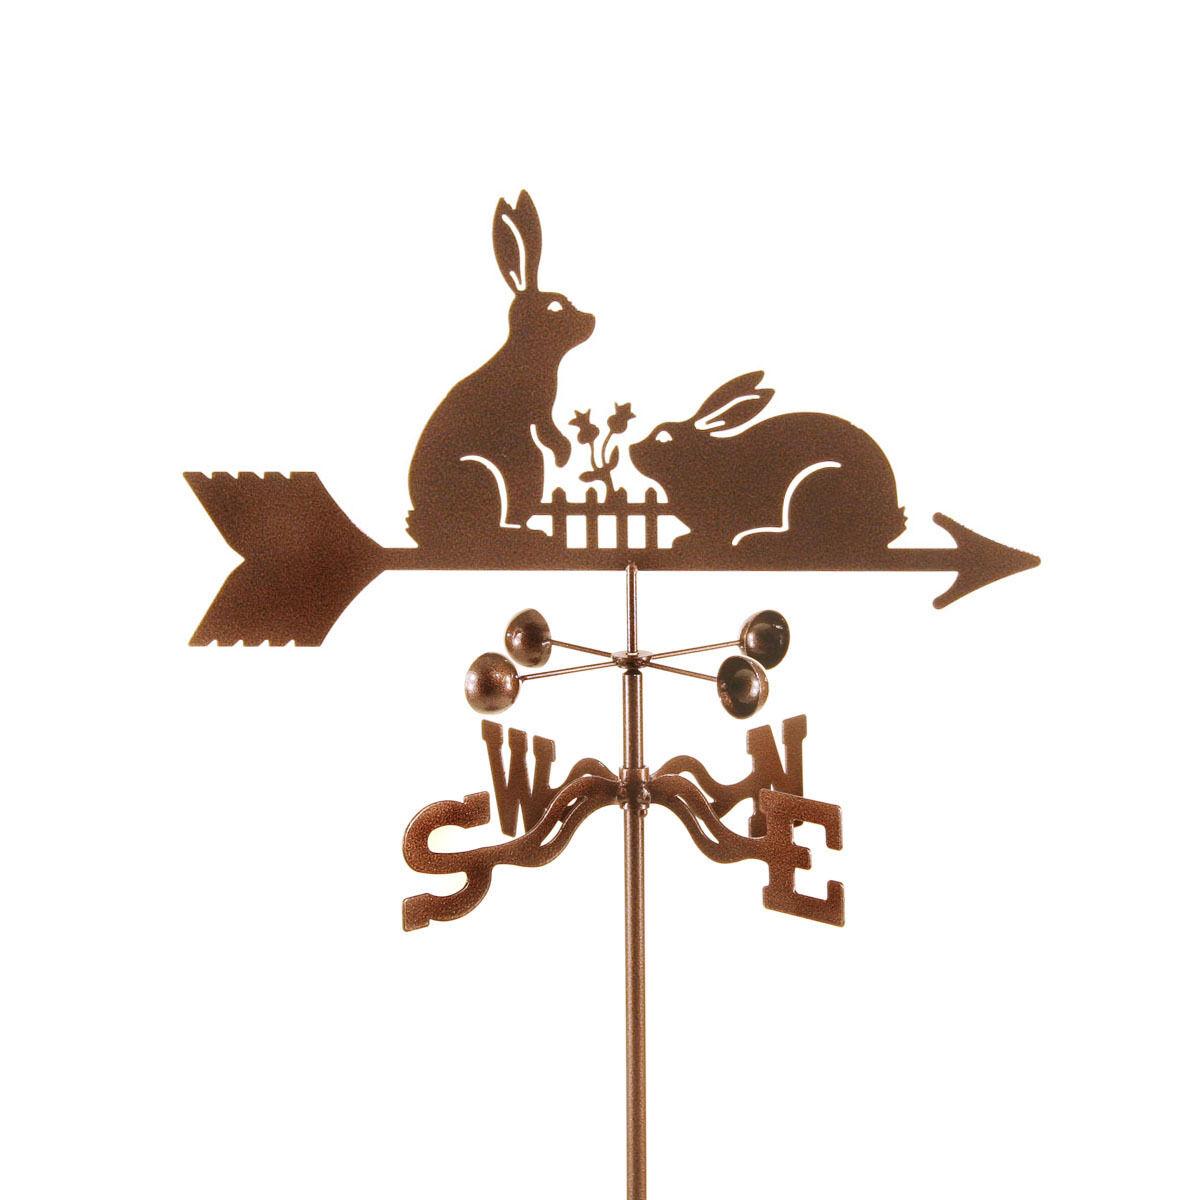 Rabbits, Rabbit Weathervane - Bunnies, Bunney, Bunny Vane w/ Choice of Mount